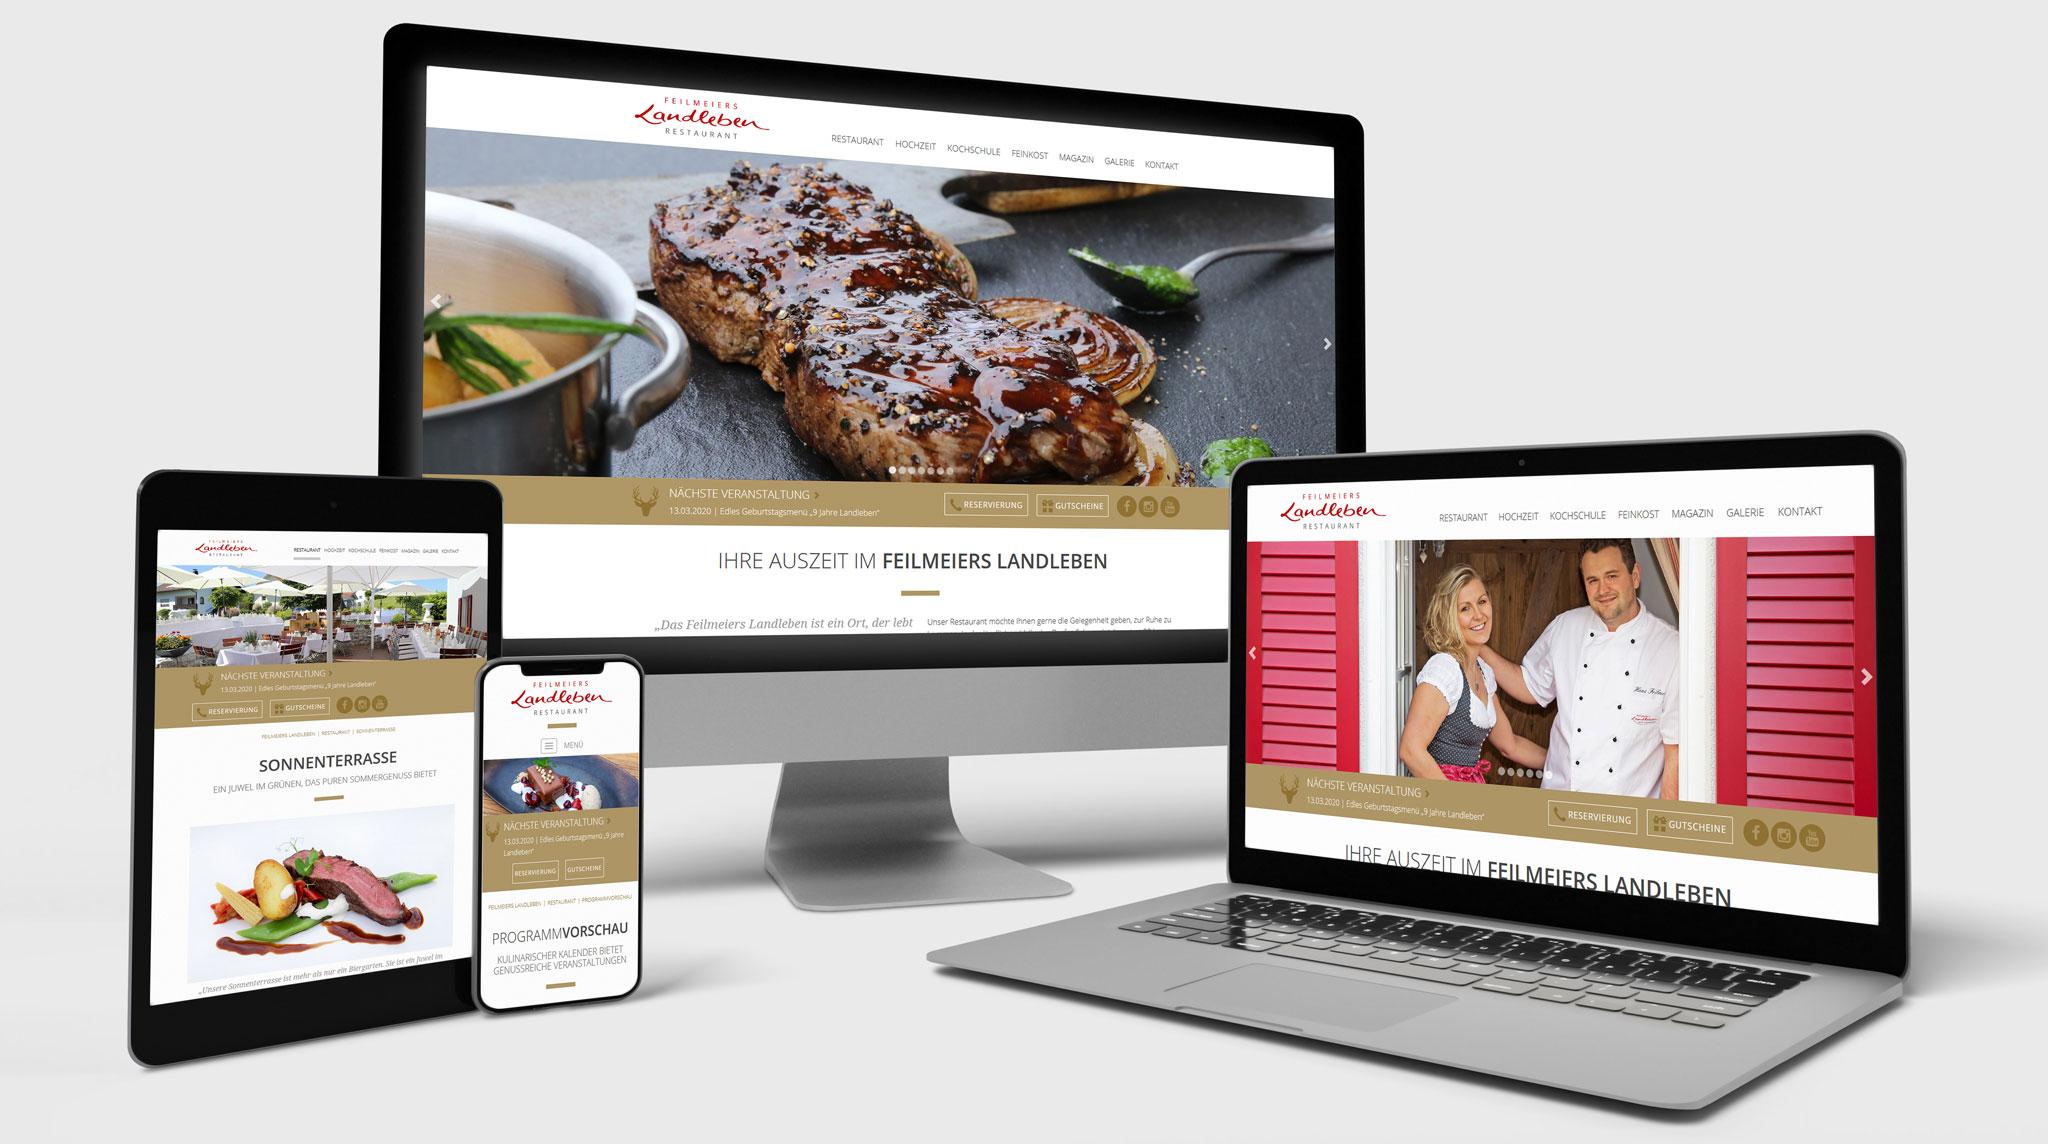 Feilmeiers Landleben Website | Werbeagentur Roland C. Ritter